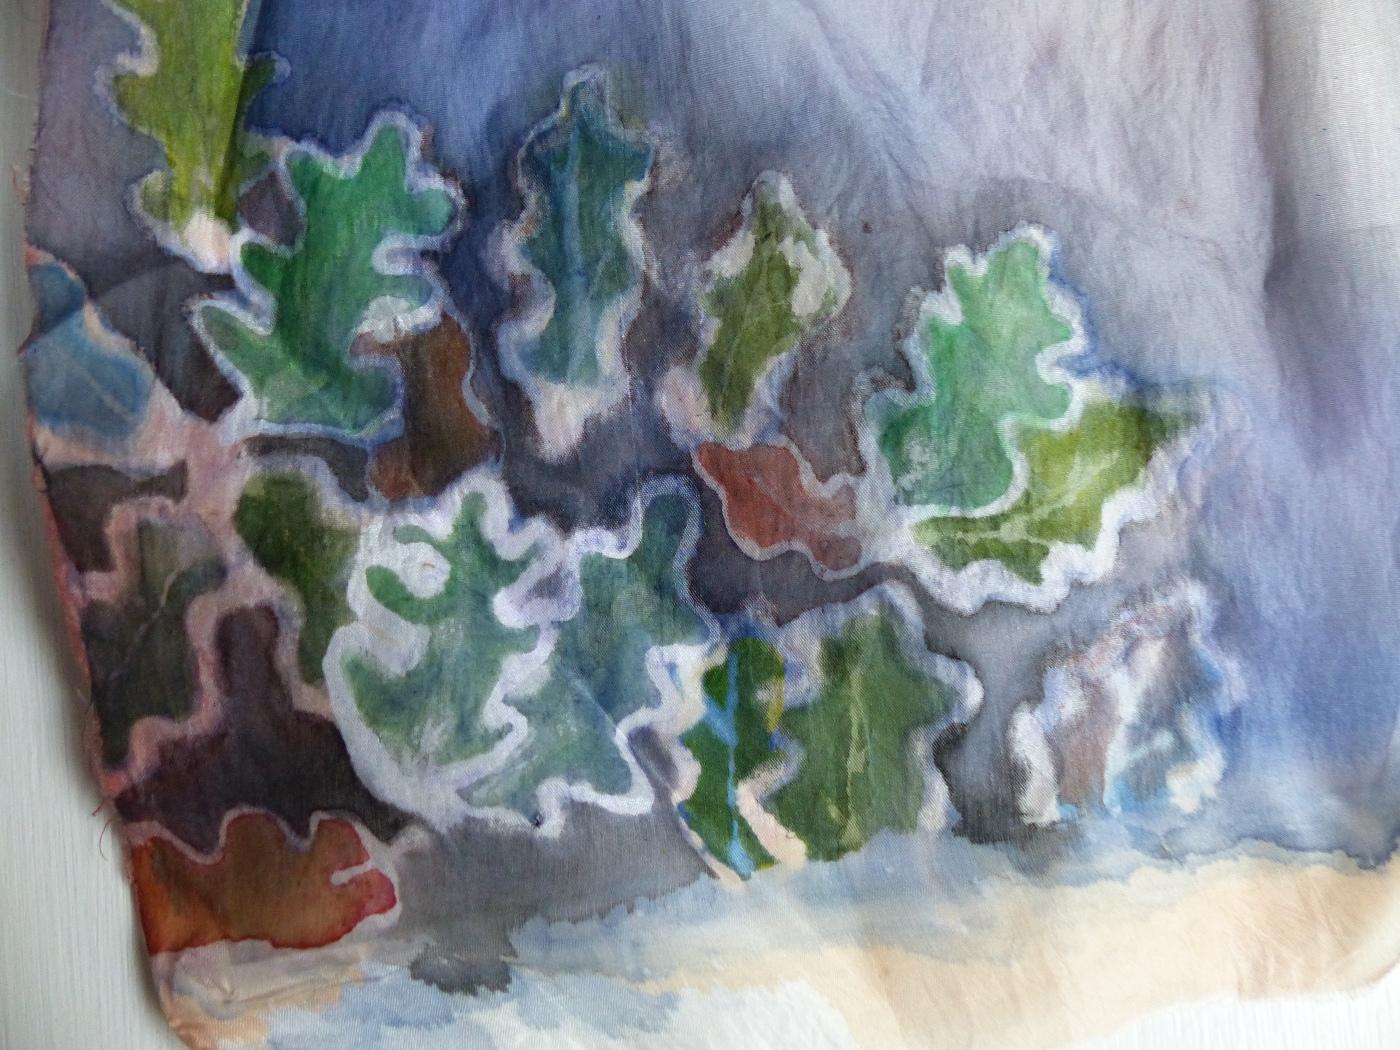 Dusky oak leaves